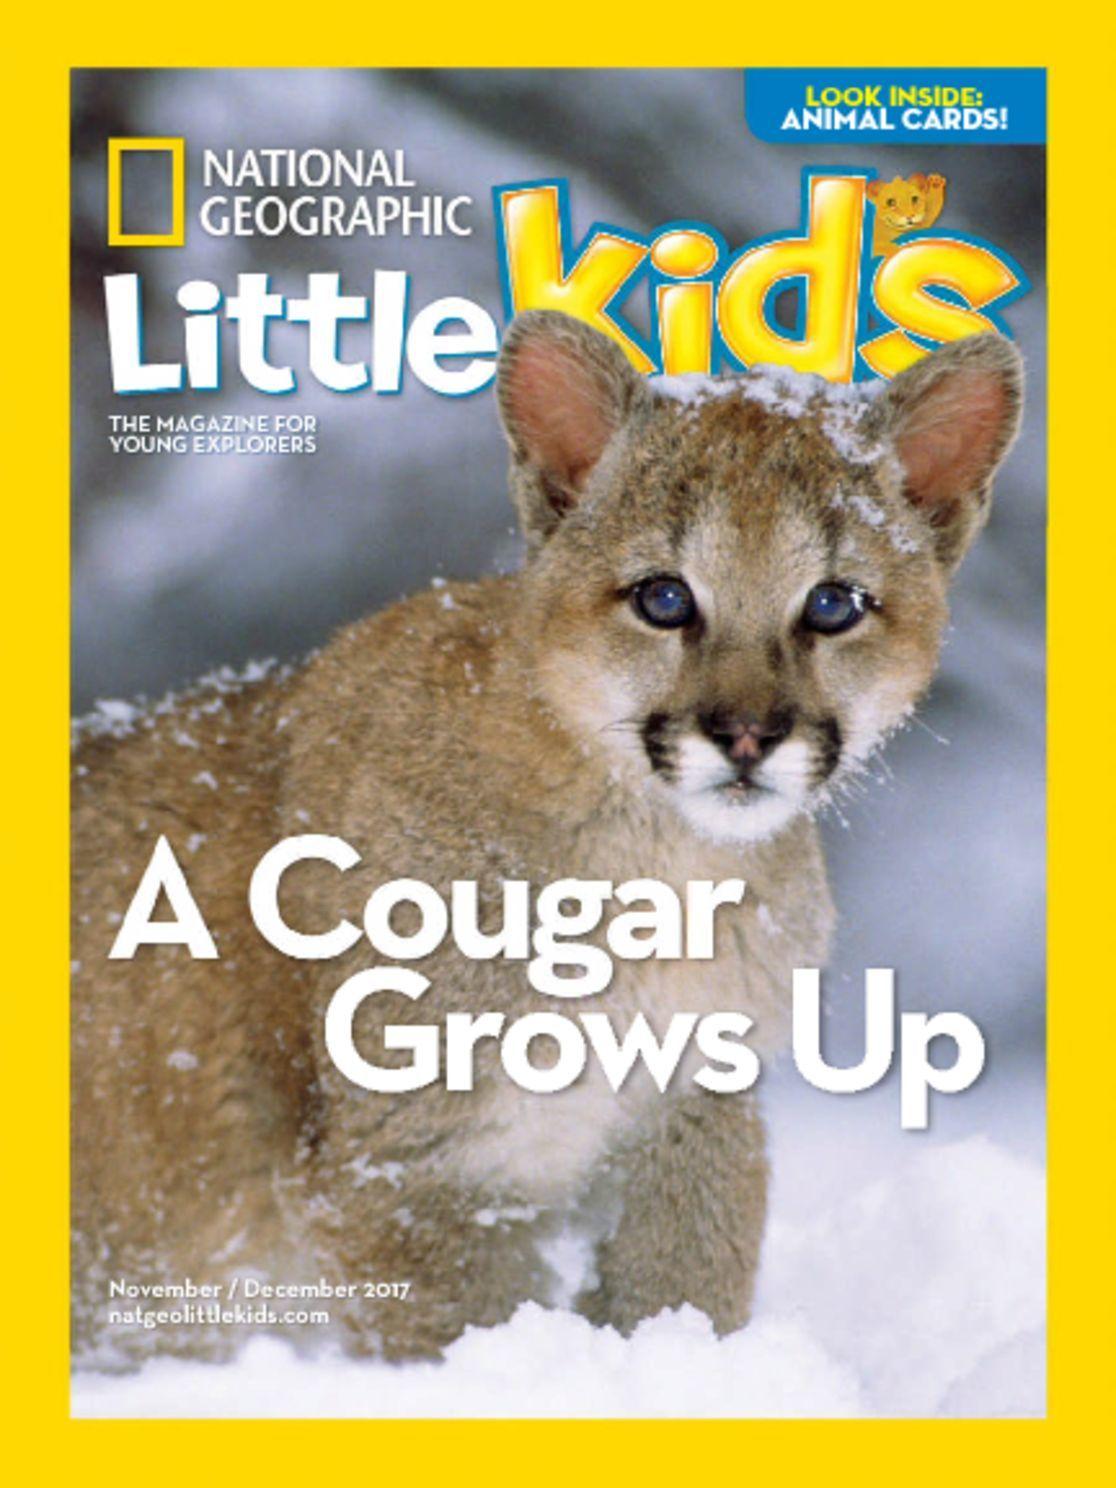 Innovative Auto Finance >> National Geographic Little Kids Magazine - DiscountMags.com